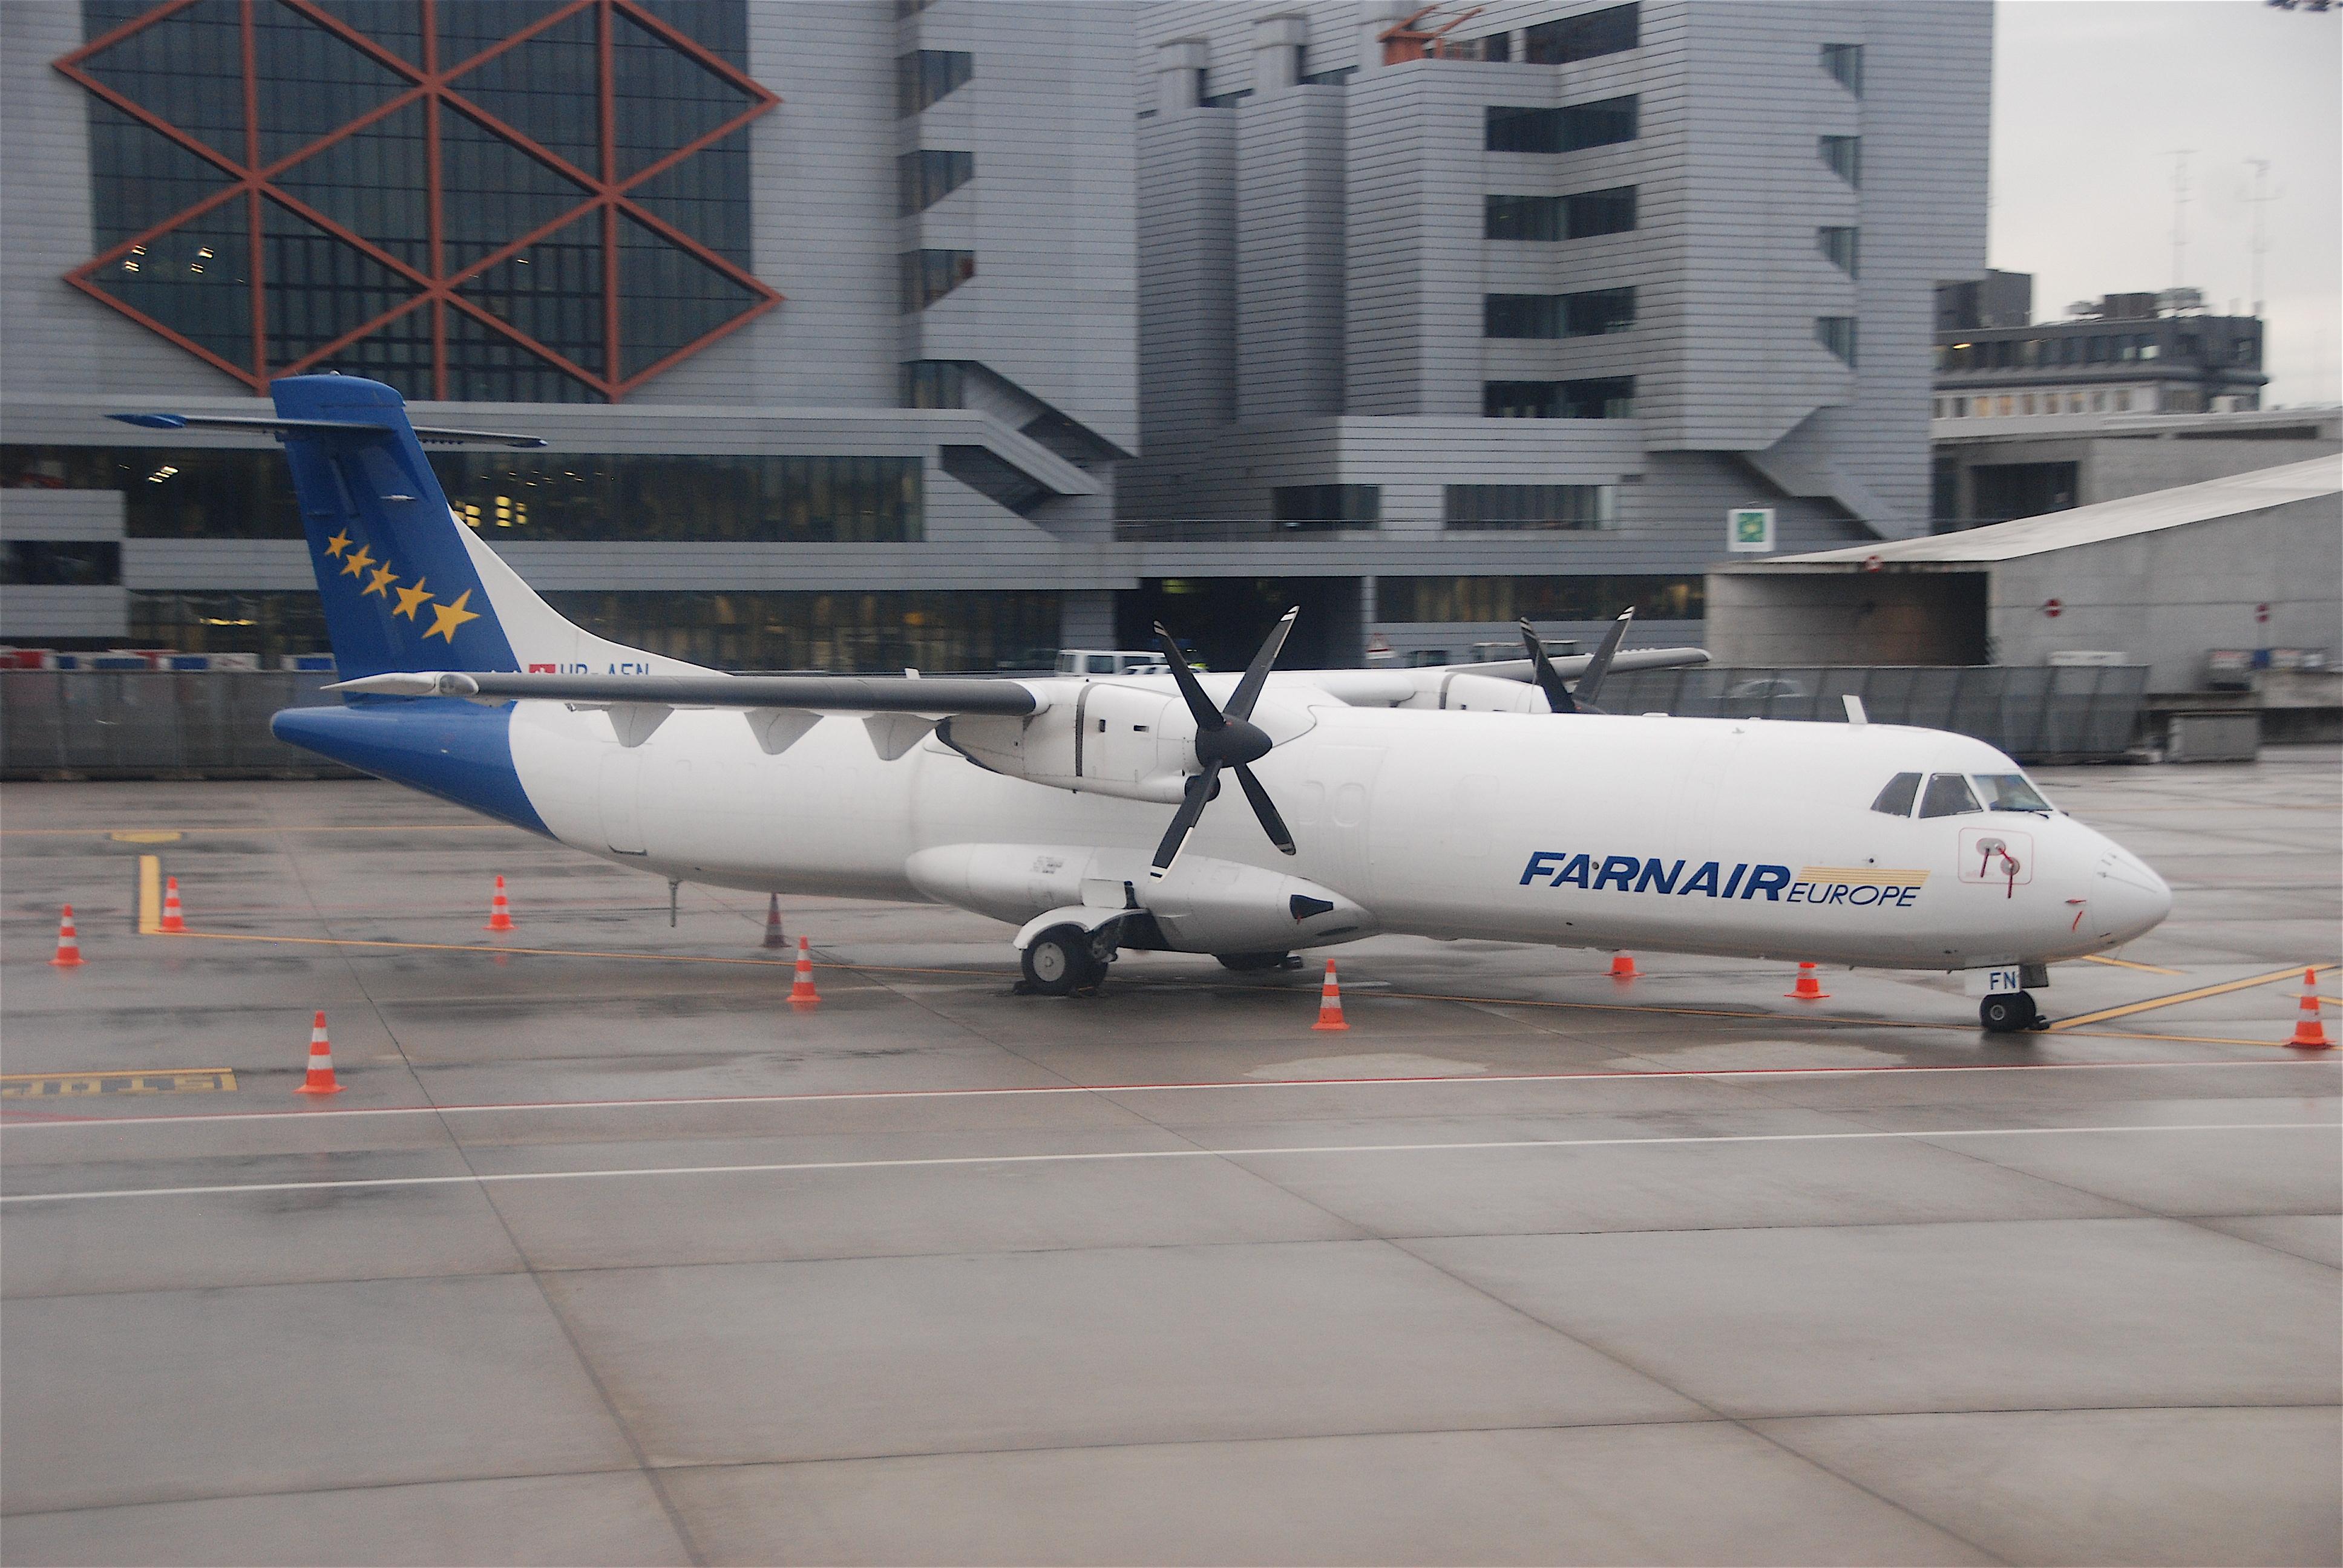 File:Farnair Europe ATR 72, HB-AFN@ZRH,11 12 2009-559ac